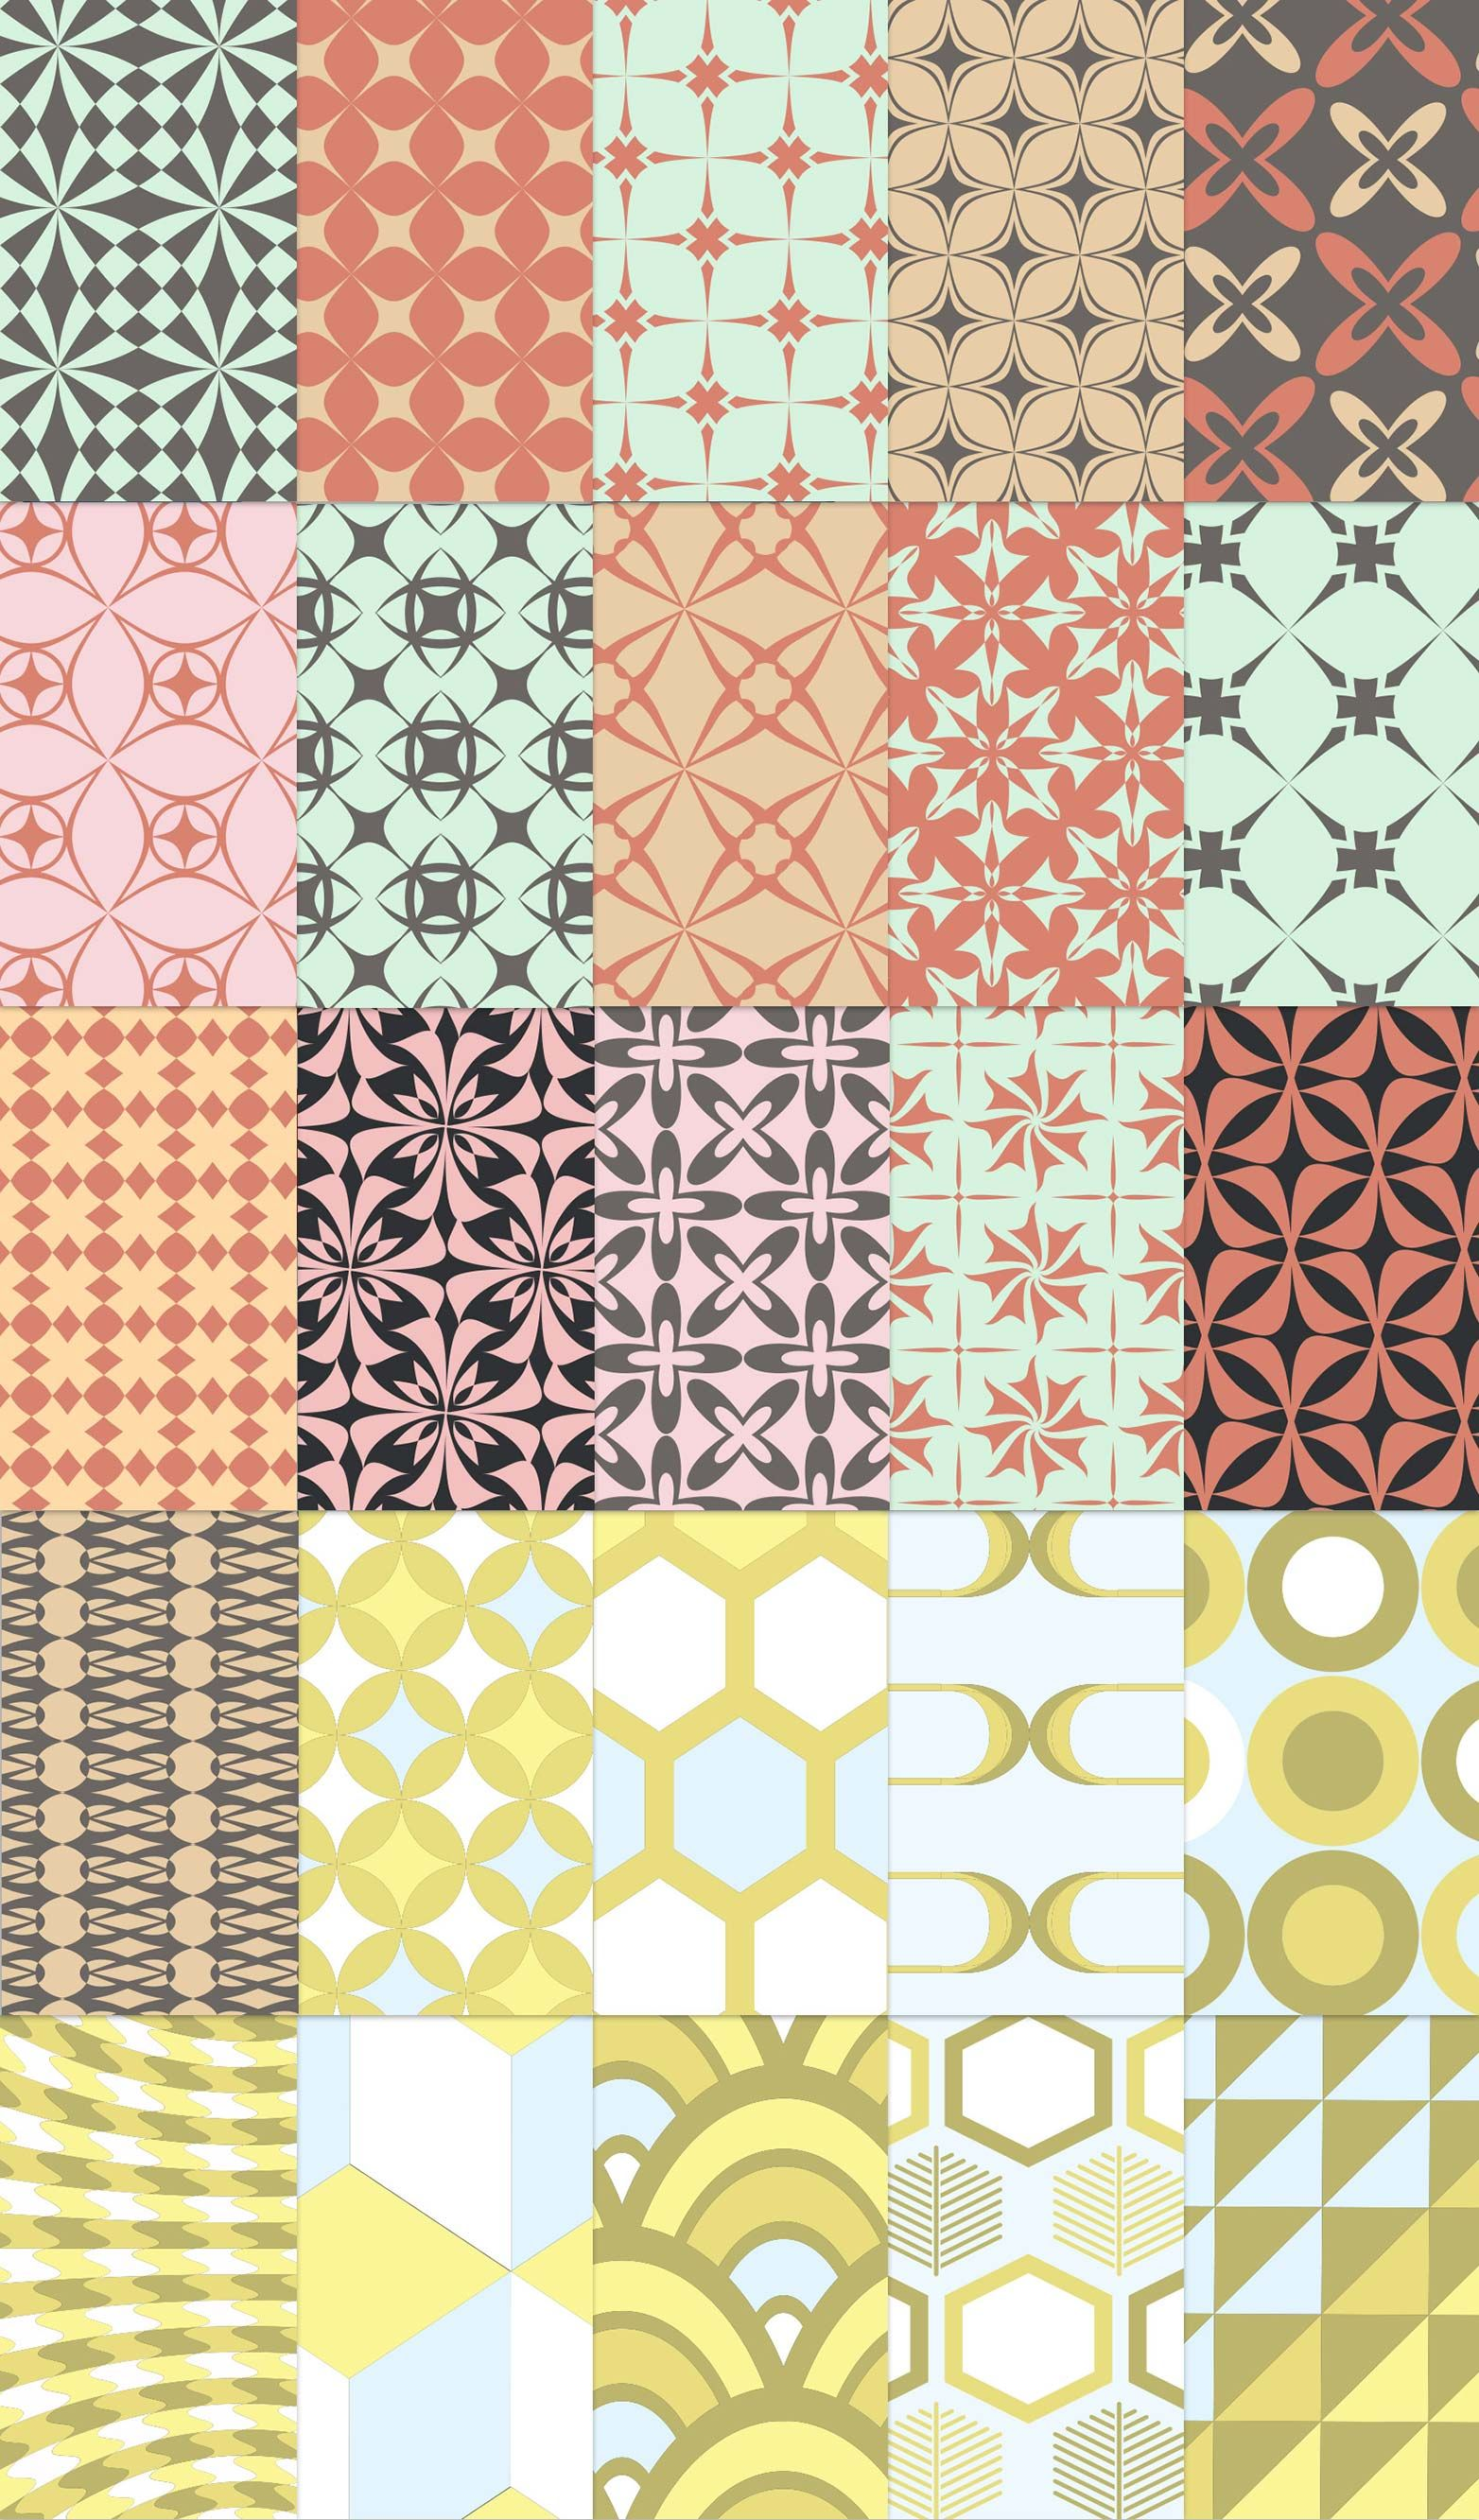 Free download 25 free retro patterns Retro pattern